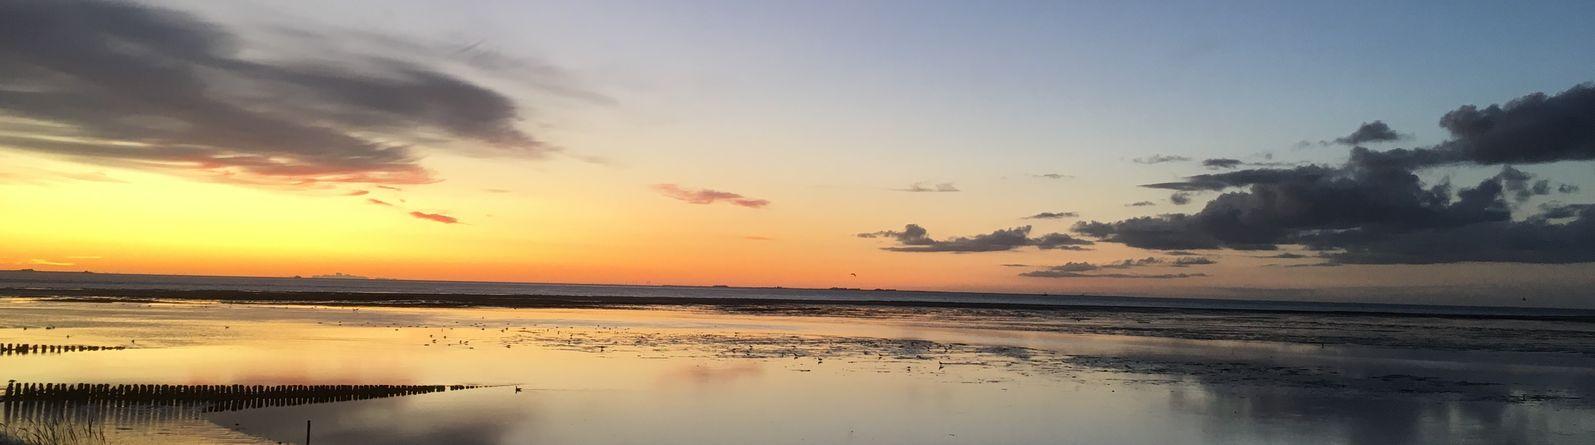 Strand Insel Amrum